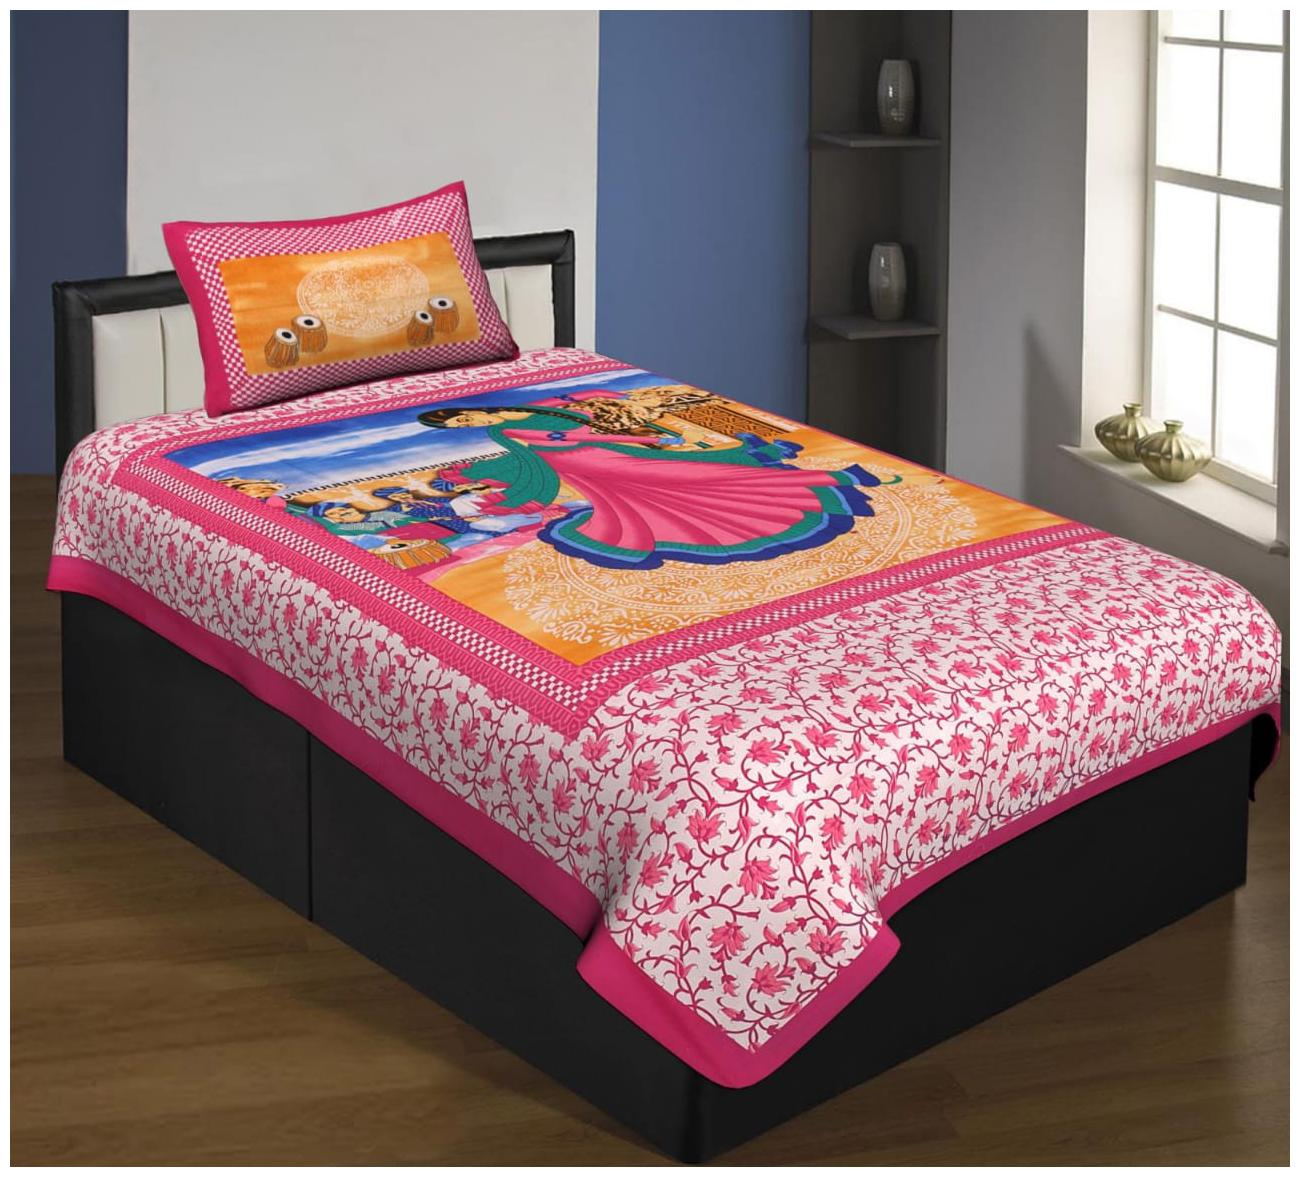 2 Pillow case-Multi -BLM Kohinoor Cotton Double Bedsheet 120 TC